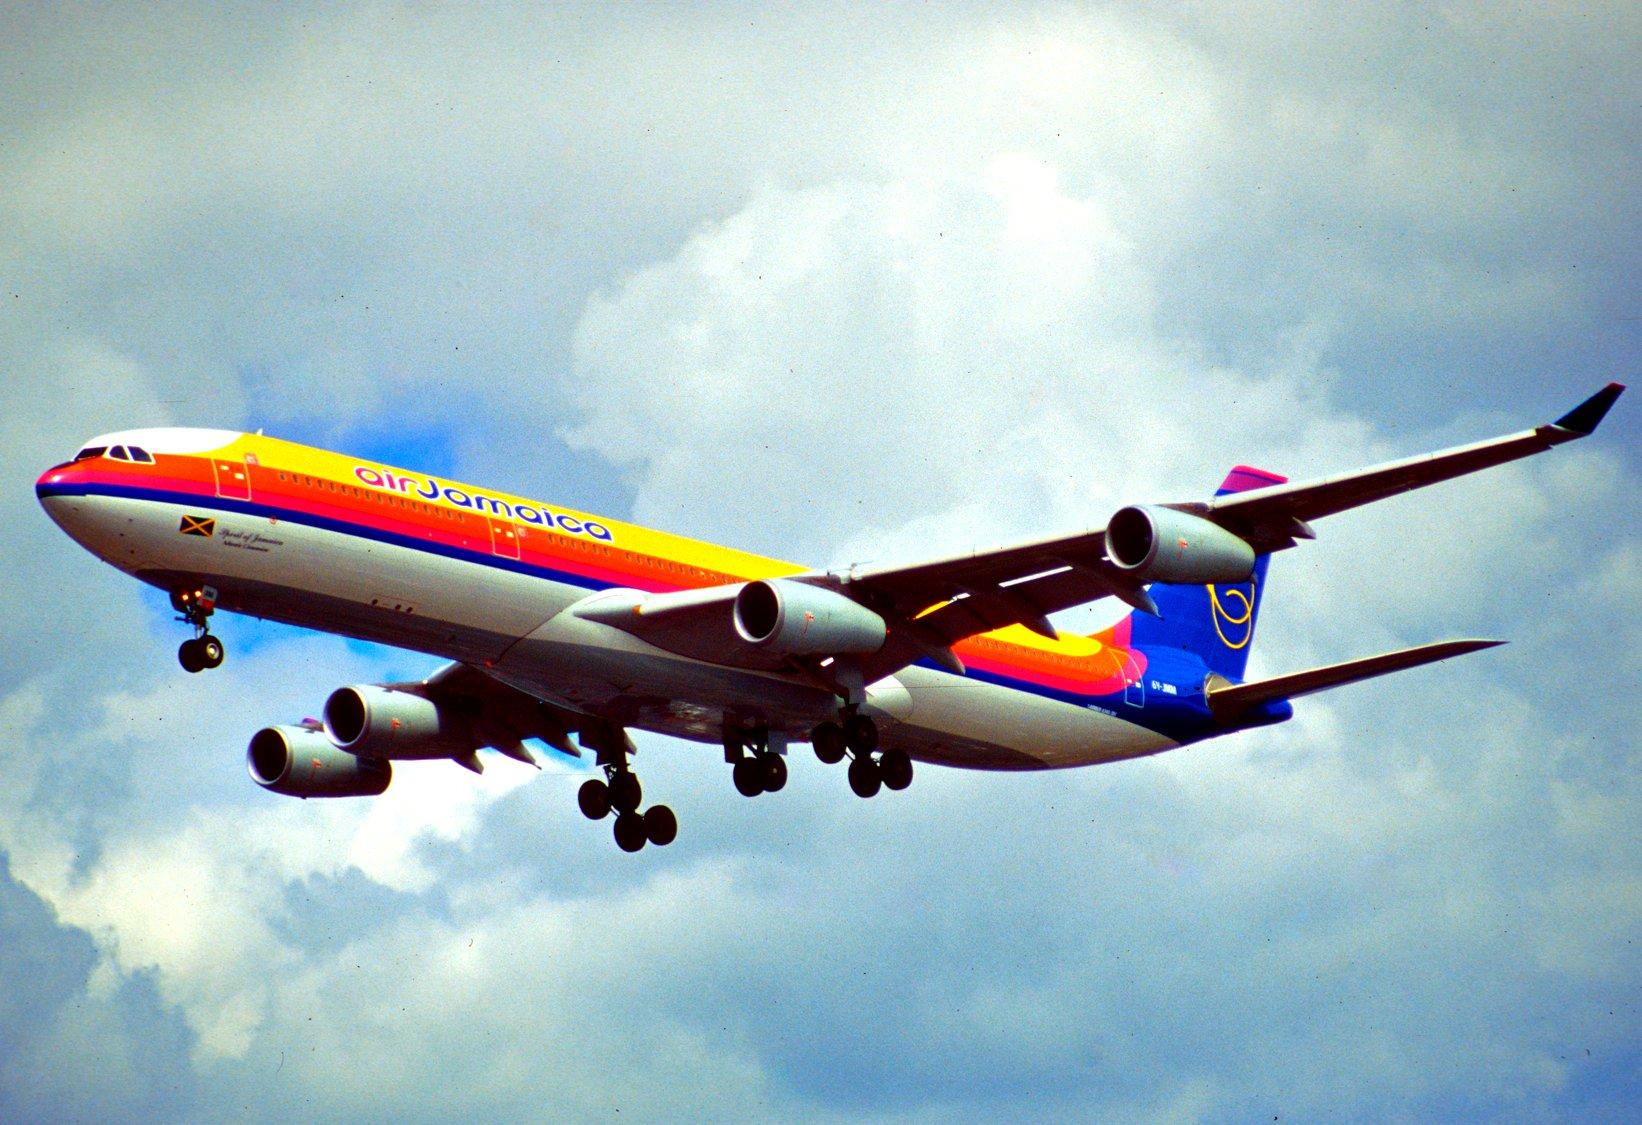 6y File:238ad - Air Jamaica Airbus A340-313X, 6Y-JMM@LHR